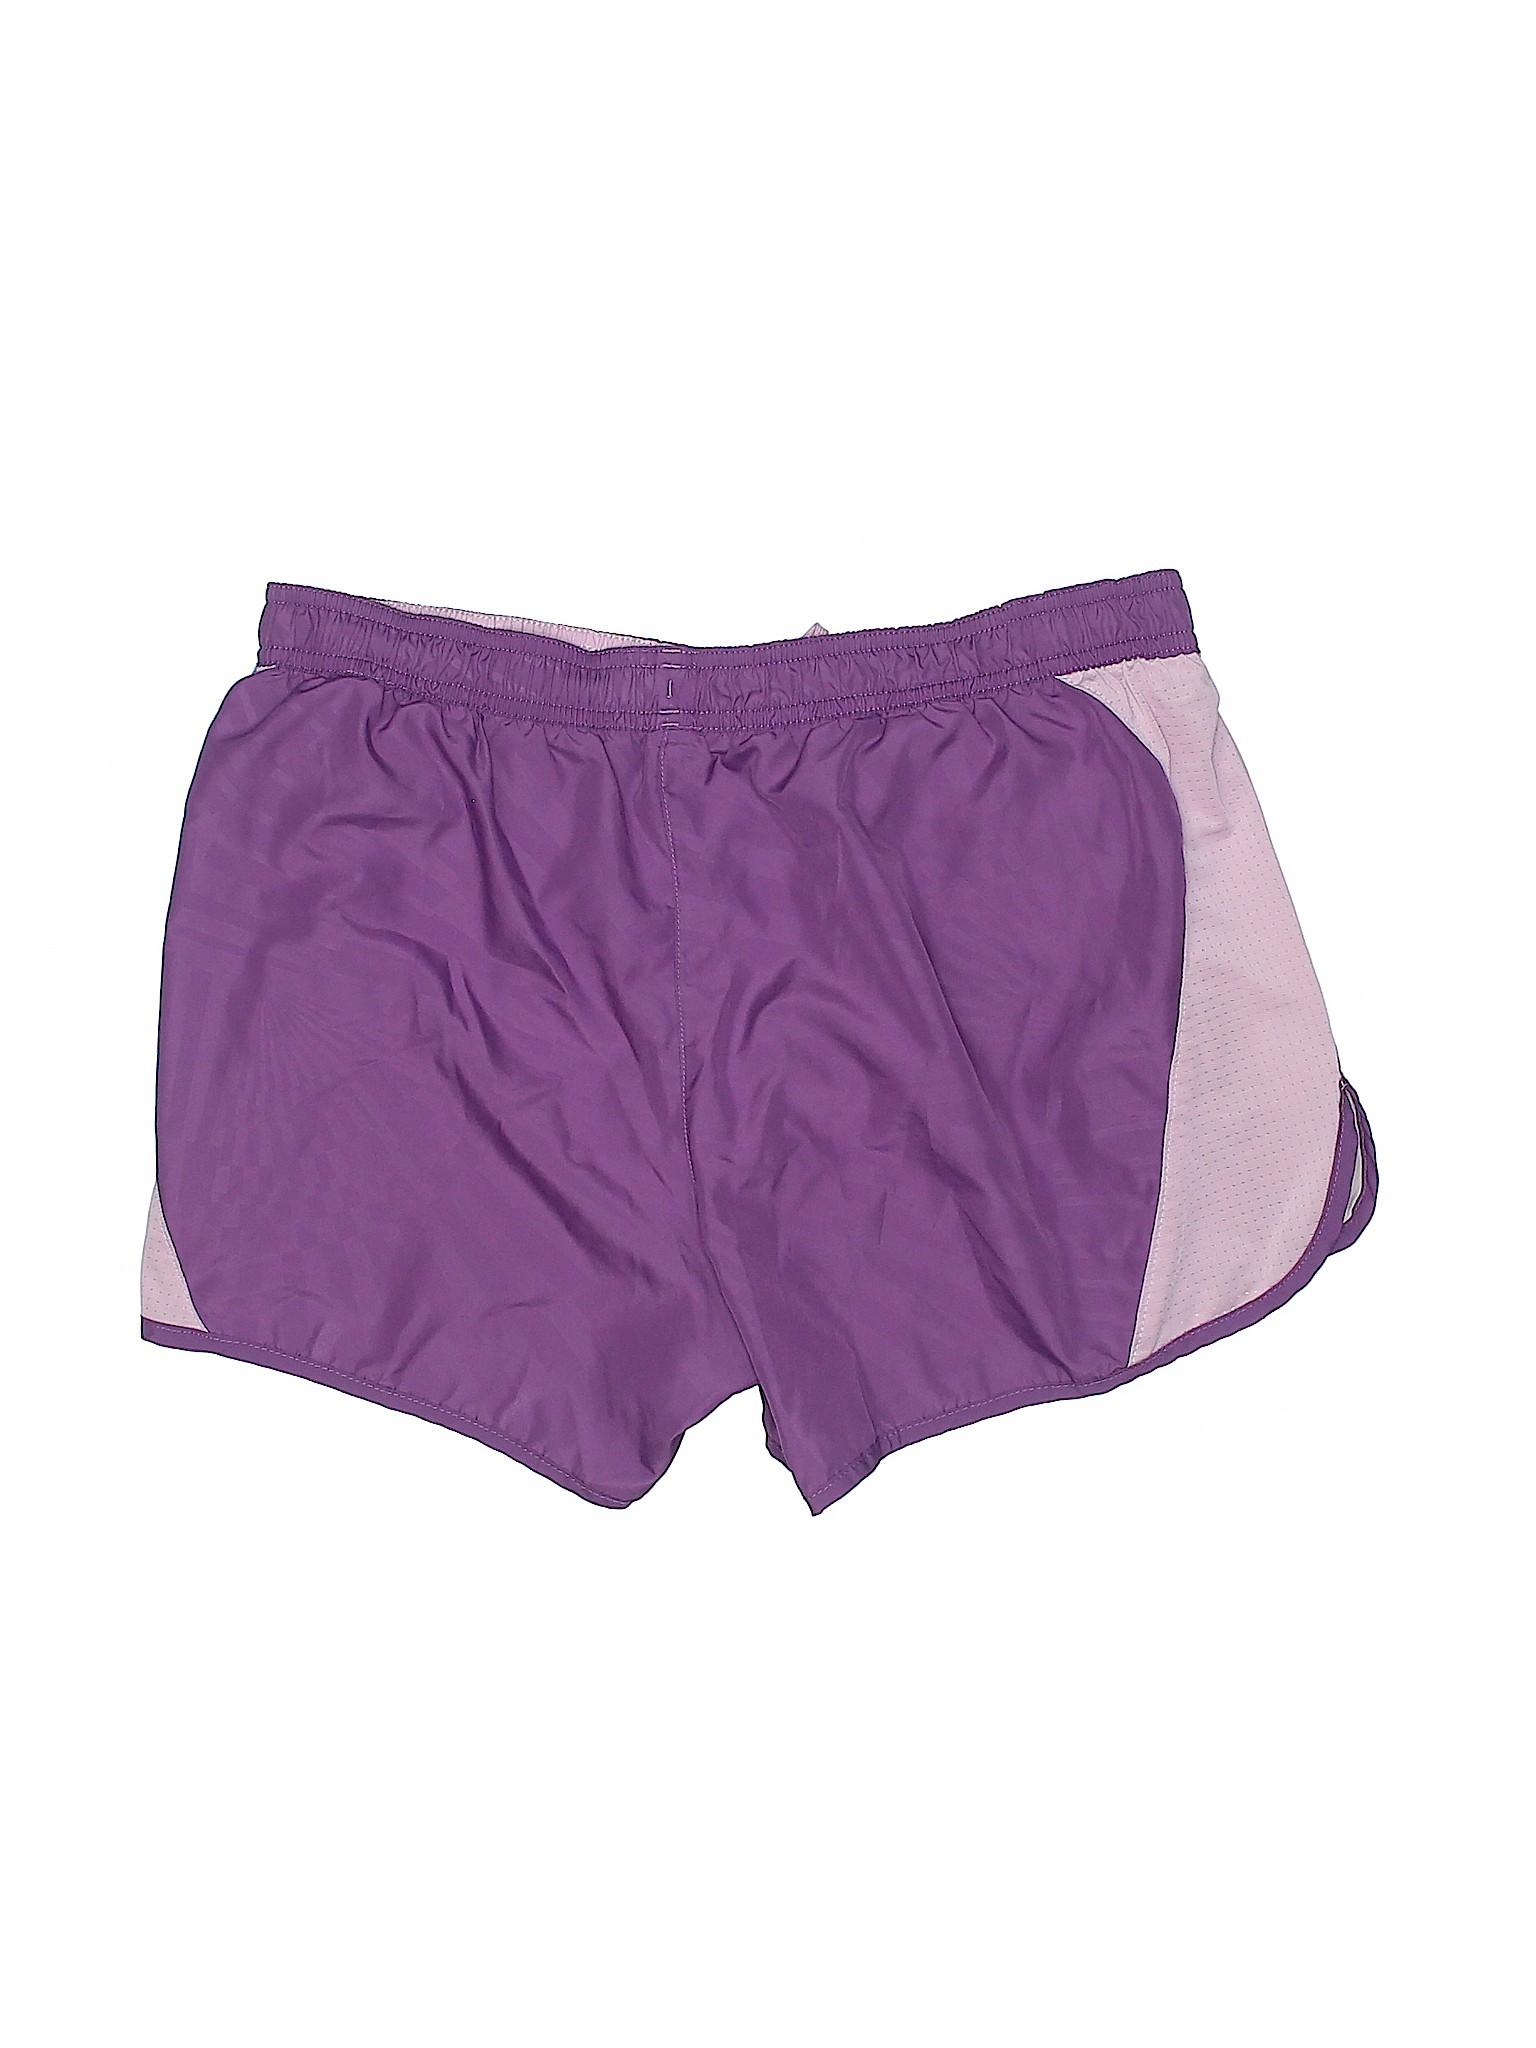 Adidas Boutique Boutique Athletic Adidas Shorts wg4qYcqEX